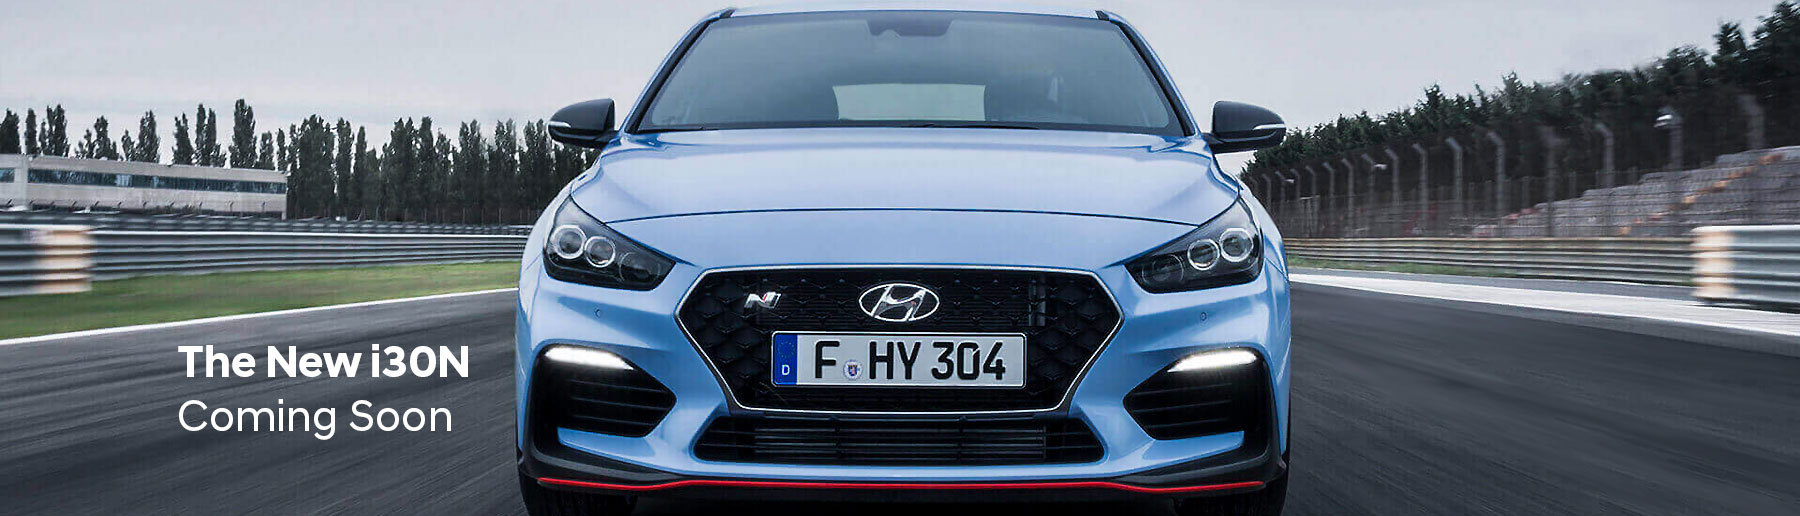 Hyundai i30N Coming Soon